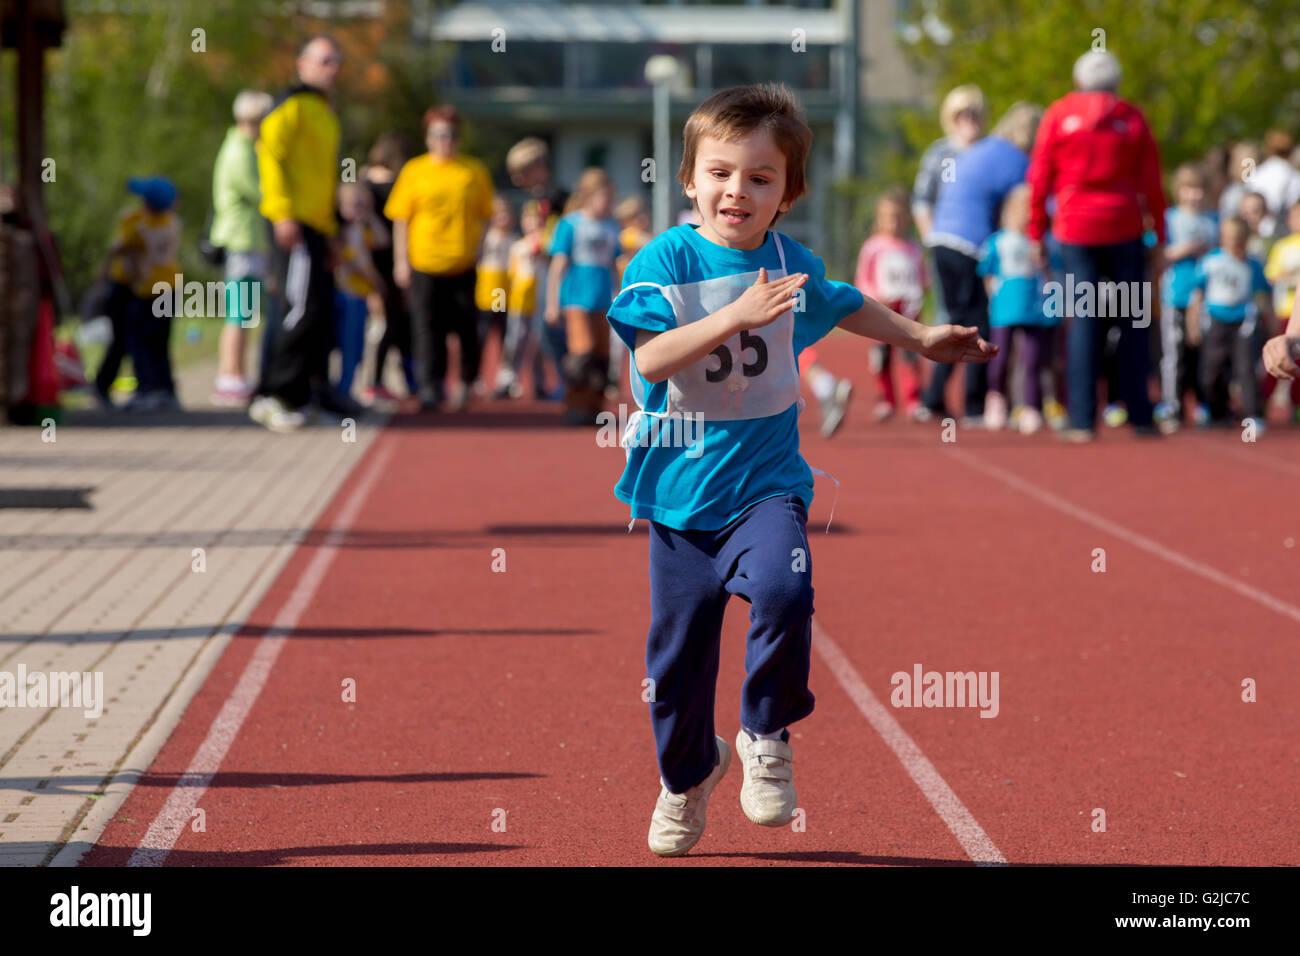 Young preschool children, running on